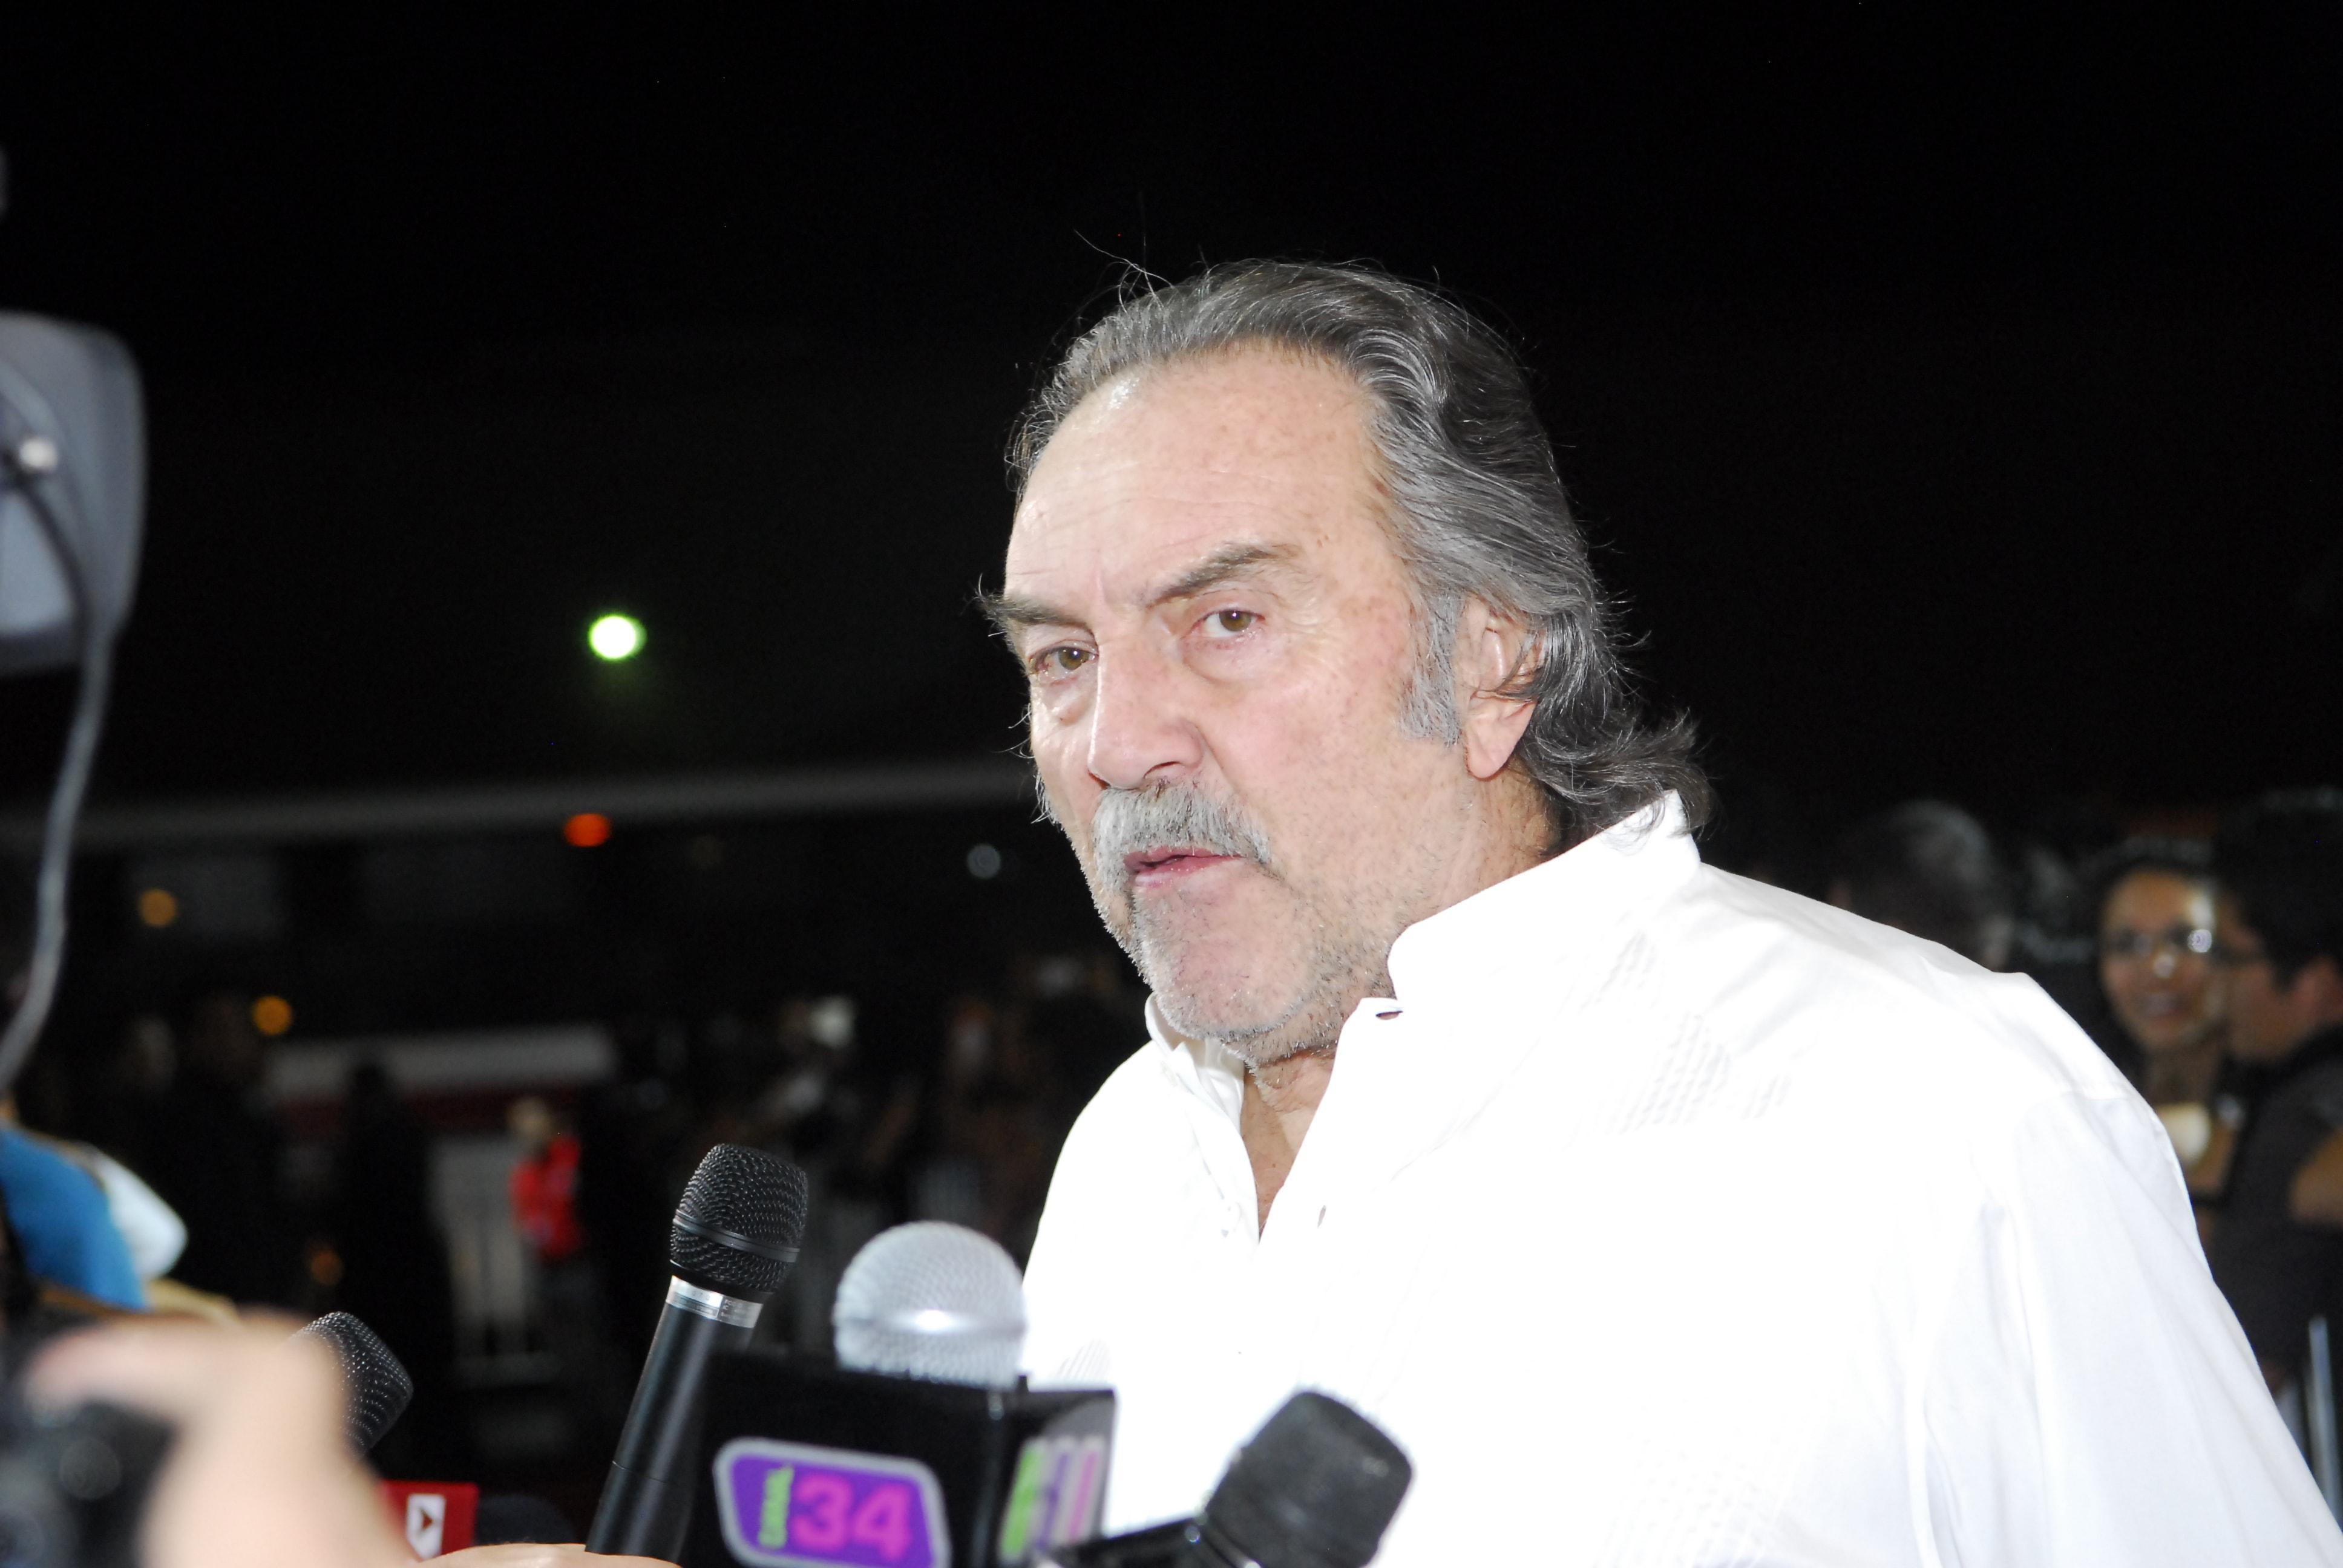 Pedro Armendariz Widescreen